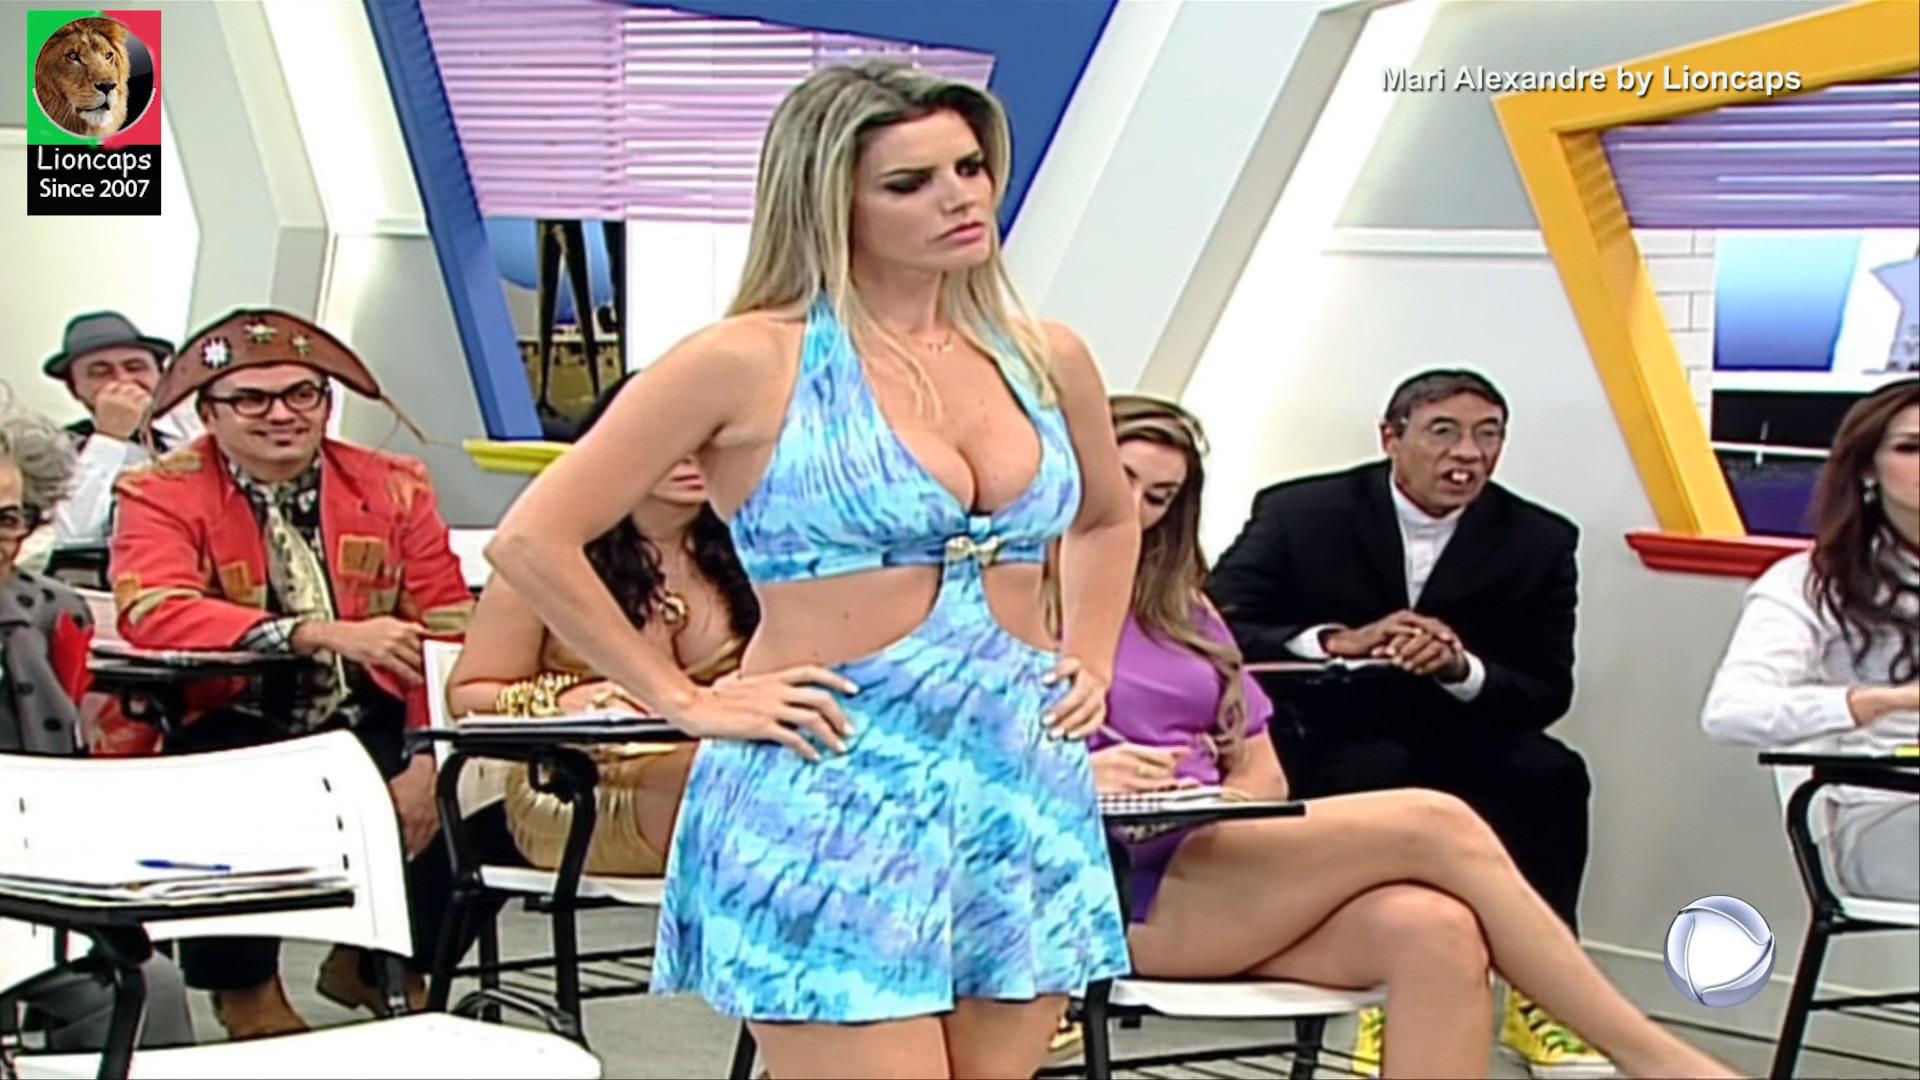 mari_alexandre_escolinha_lioncaps_08_08_2021 (13).jpg